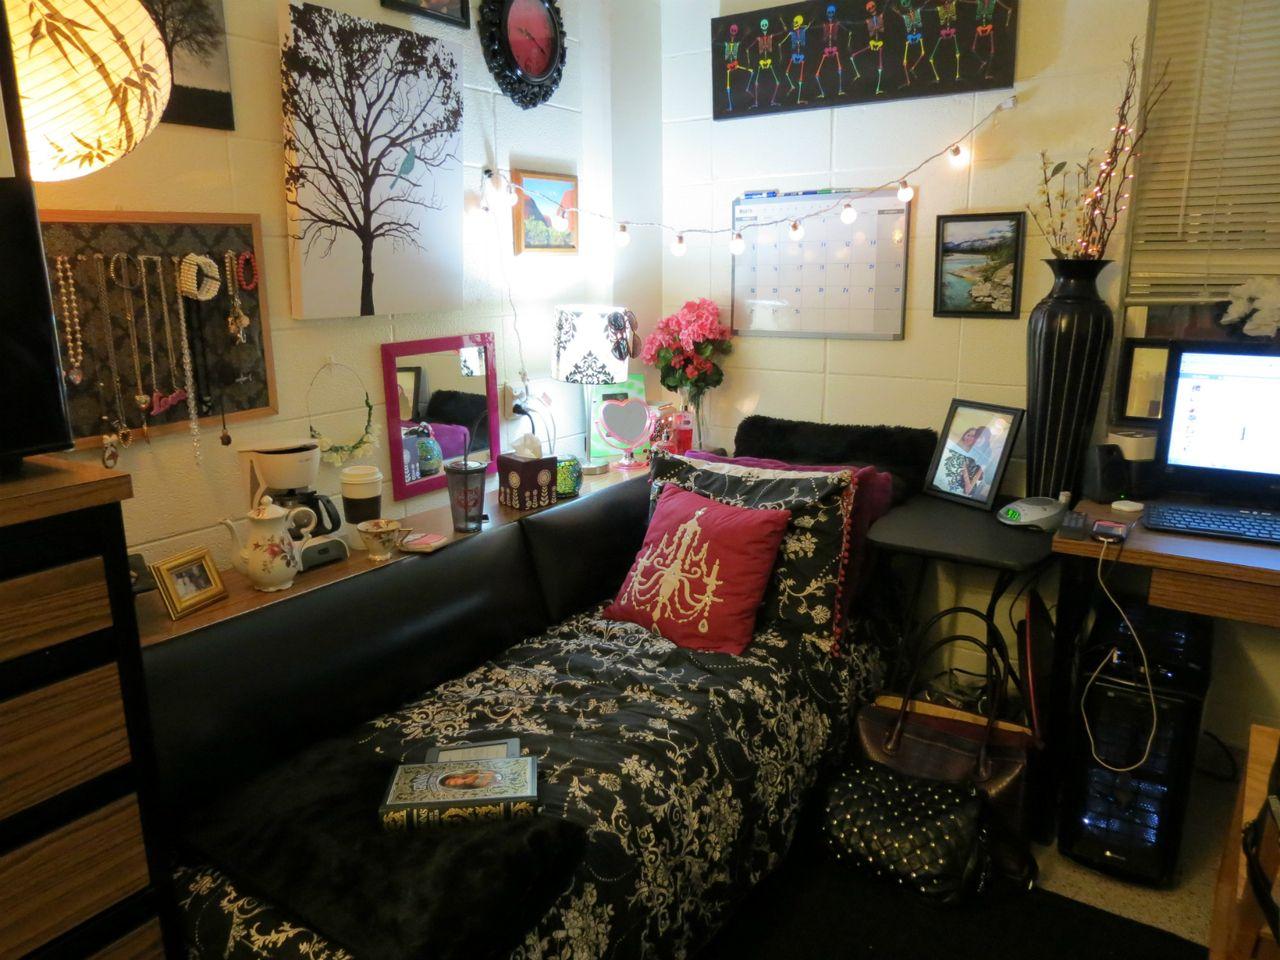 College dorm residential hall room | College Dorm | Pinterest ...